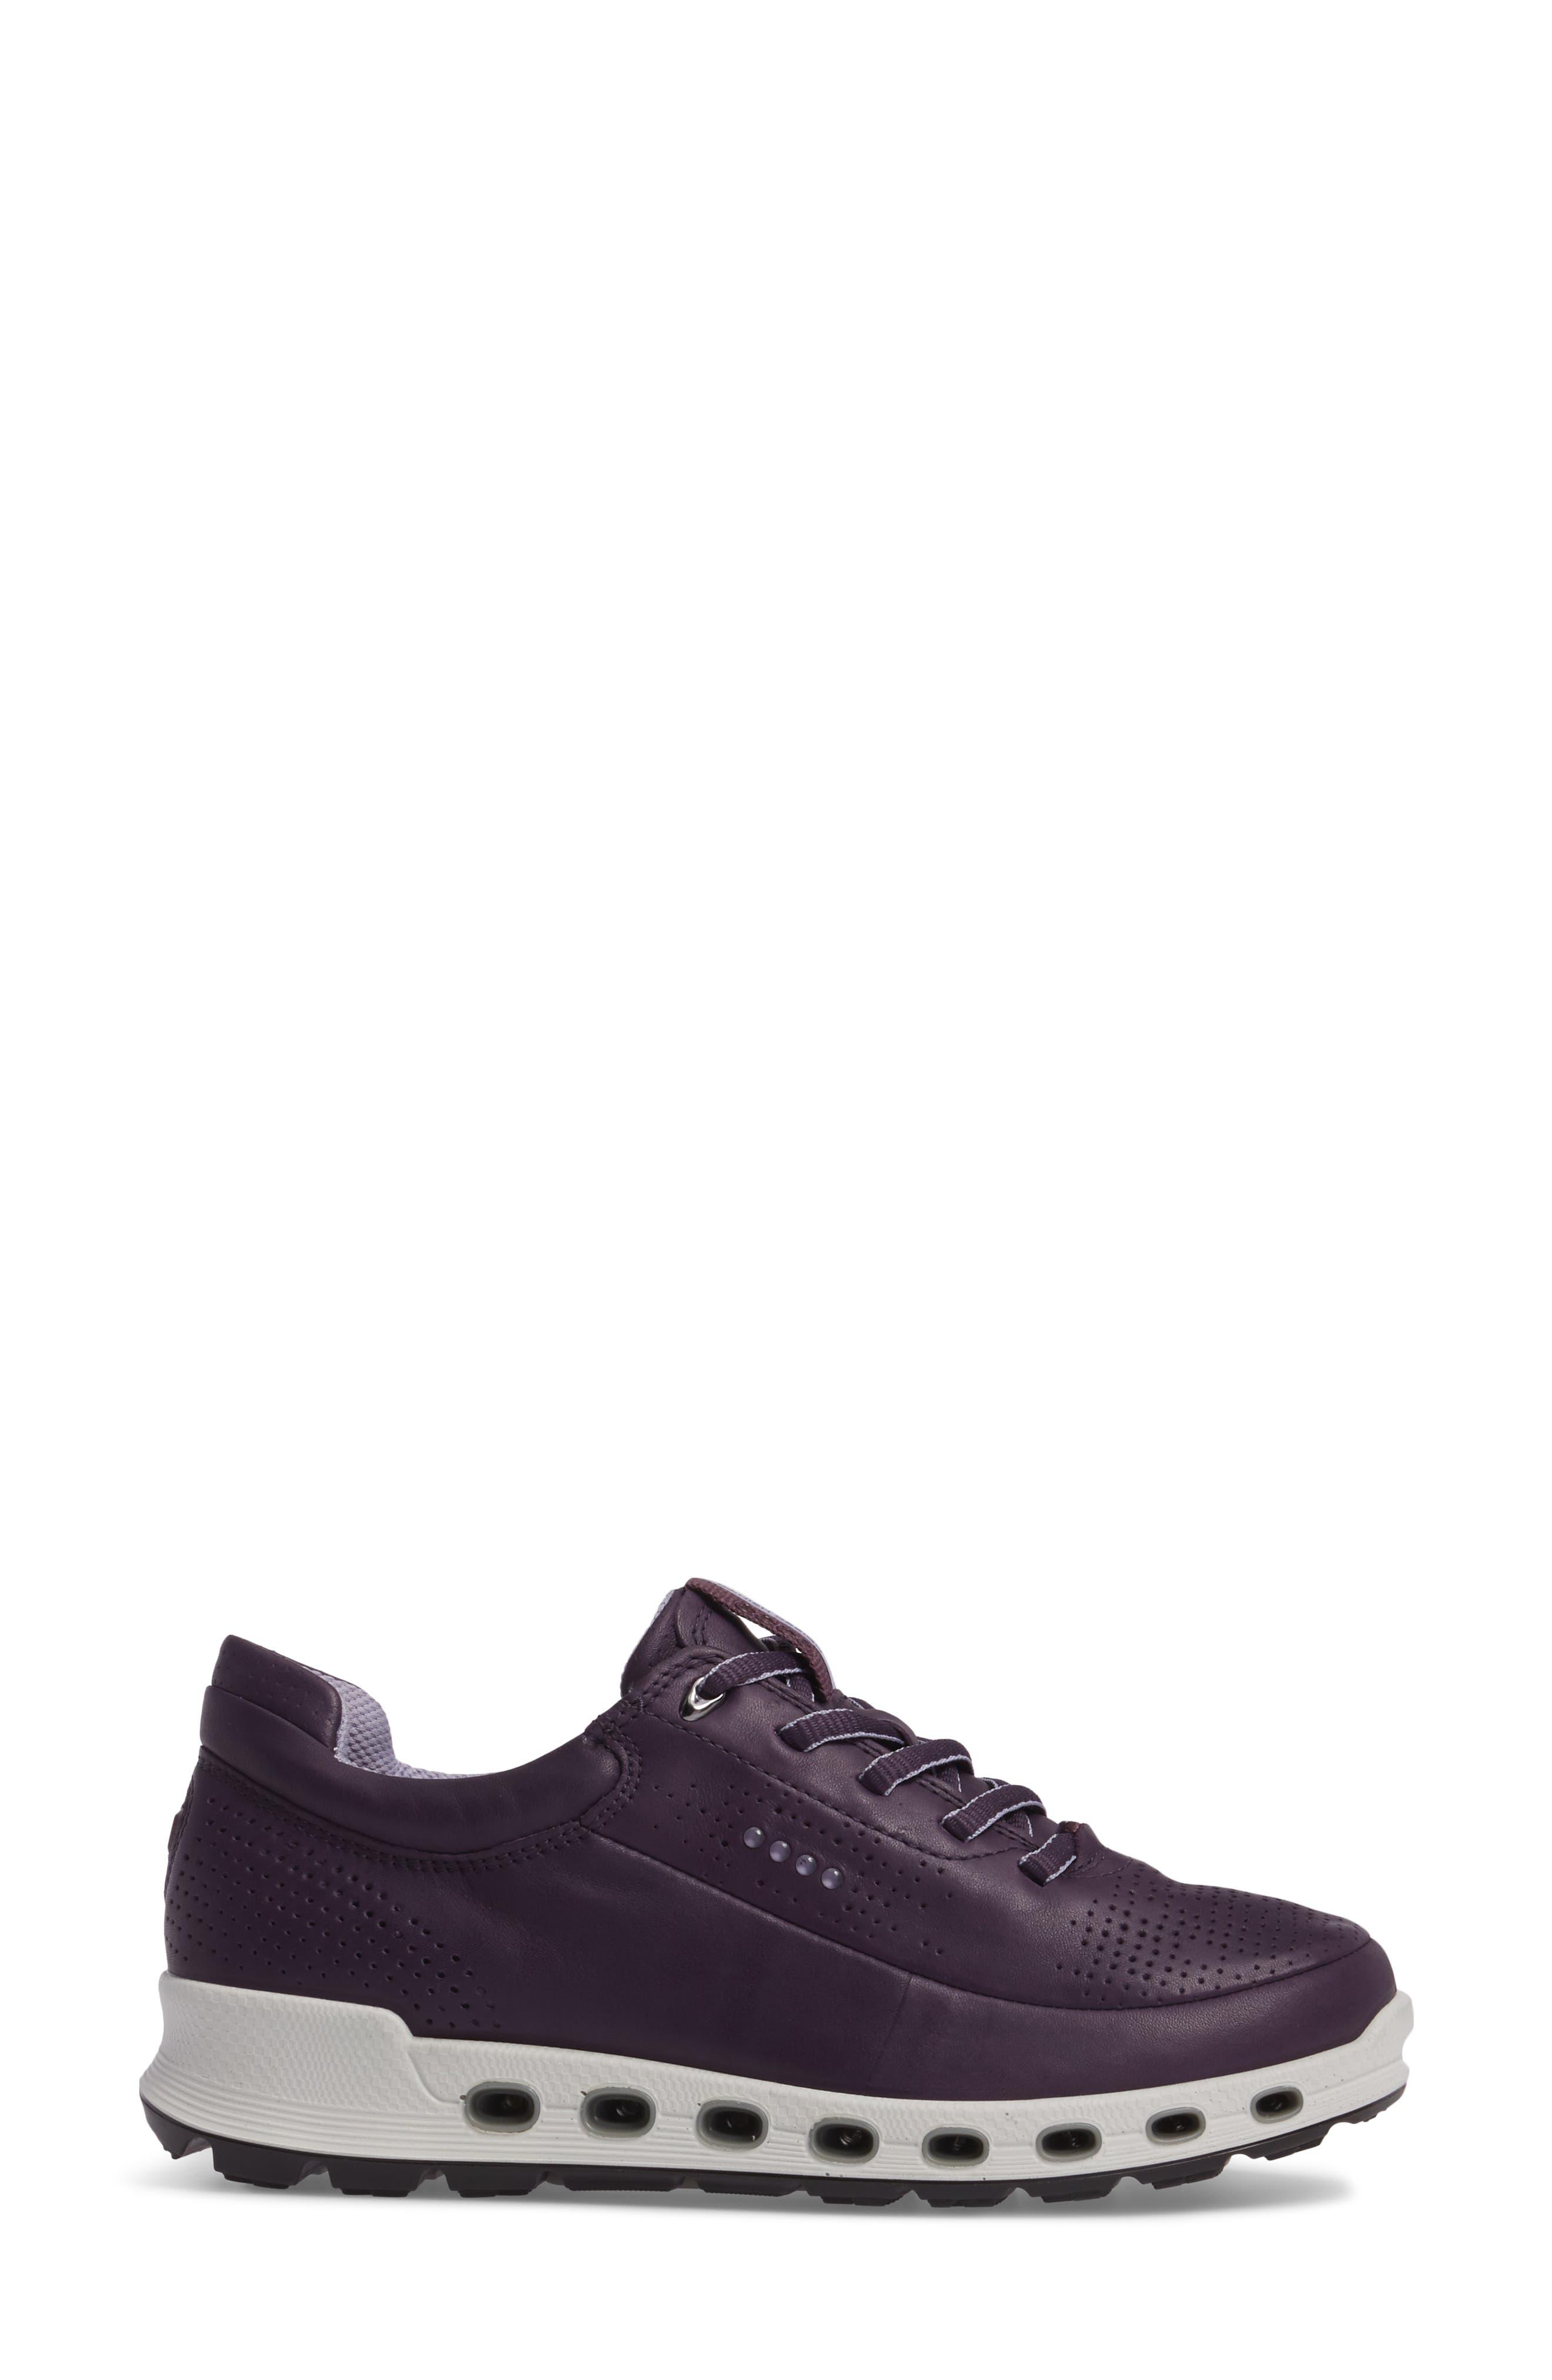 Cool 2.0 GTX Waterproof Sneaker,                             Alternate thumbnail 3, color,                             500